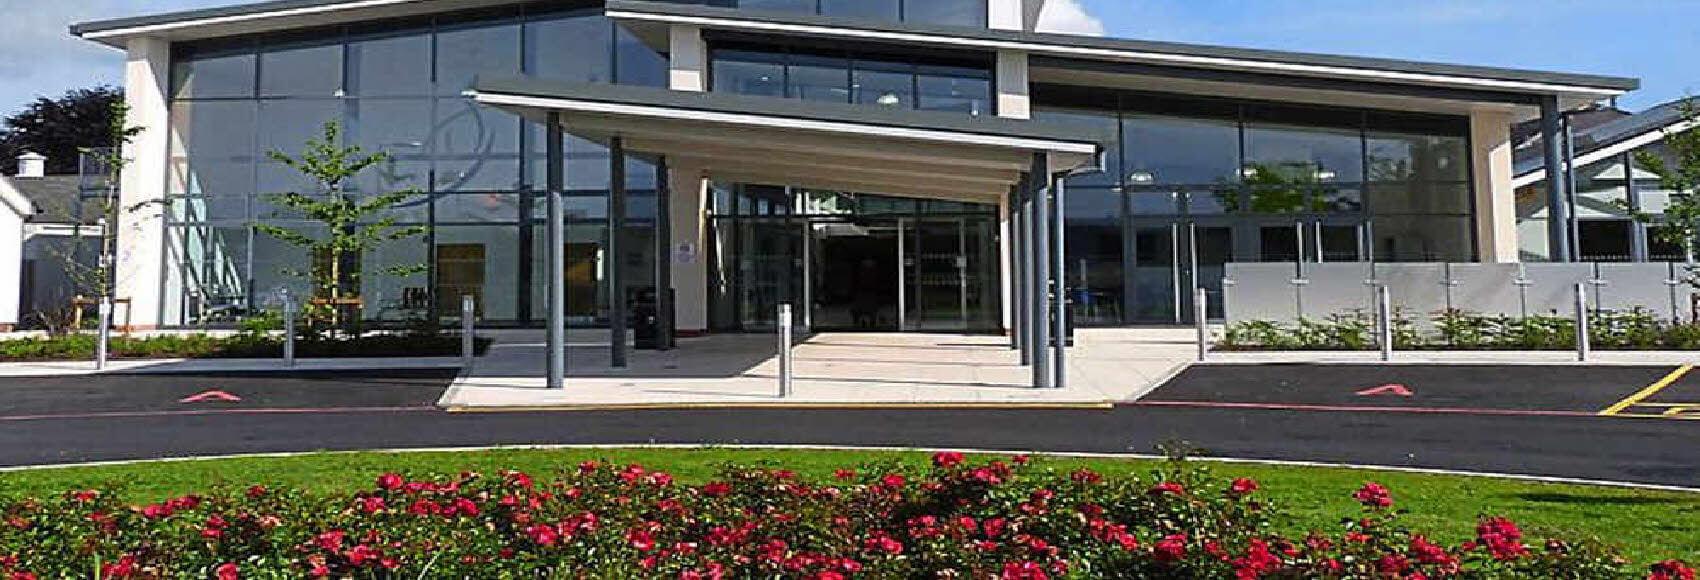 Oswestry Hospital accommodation